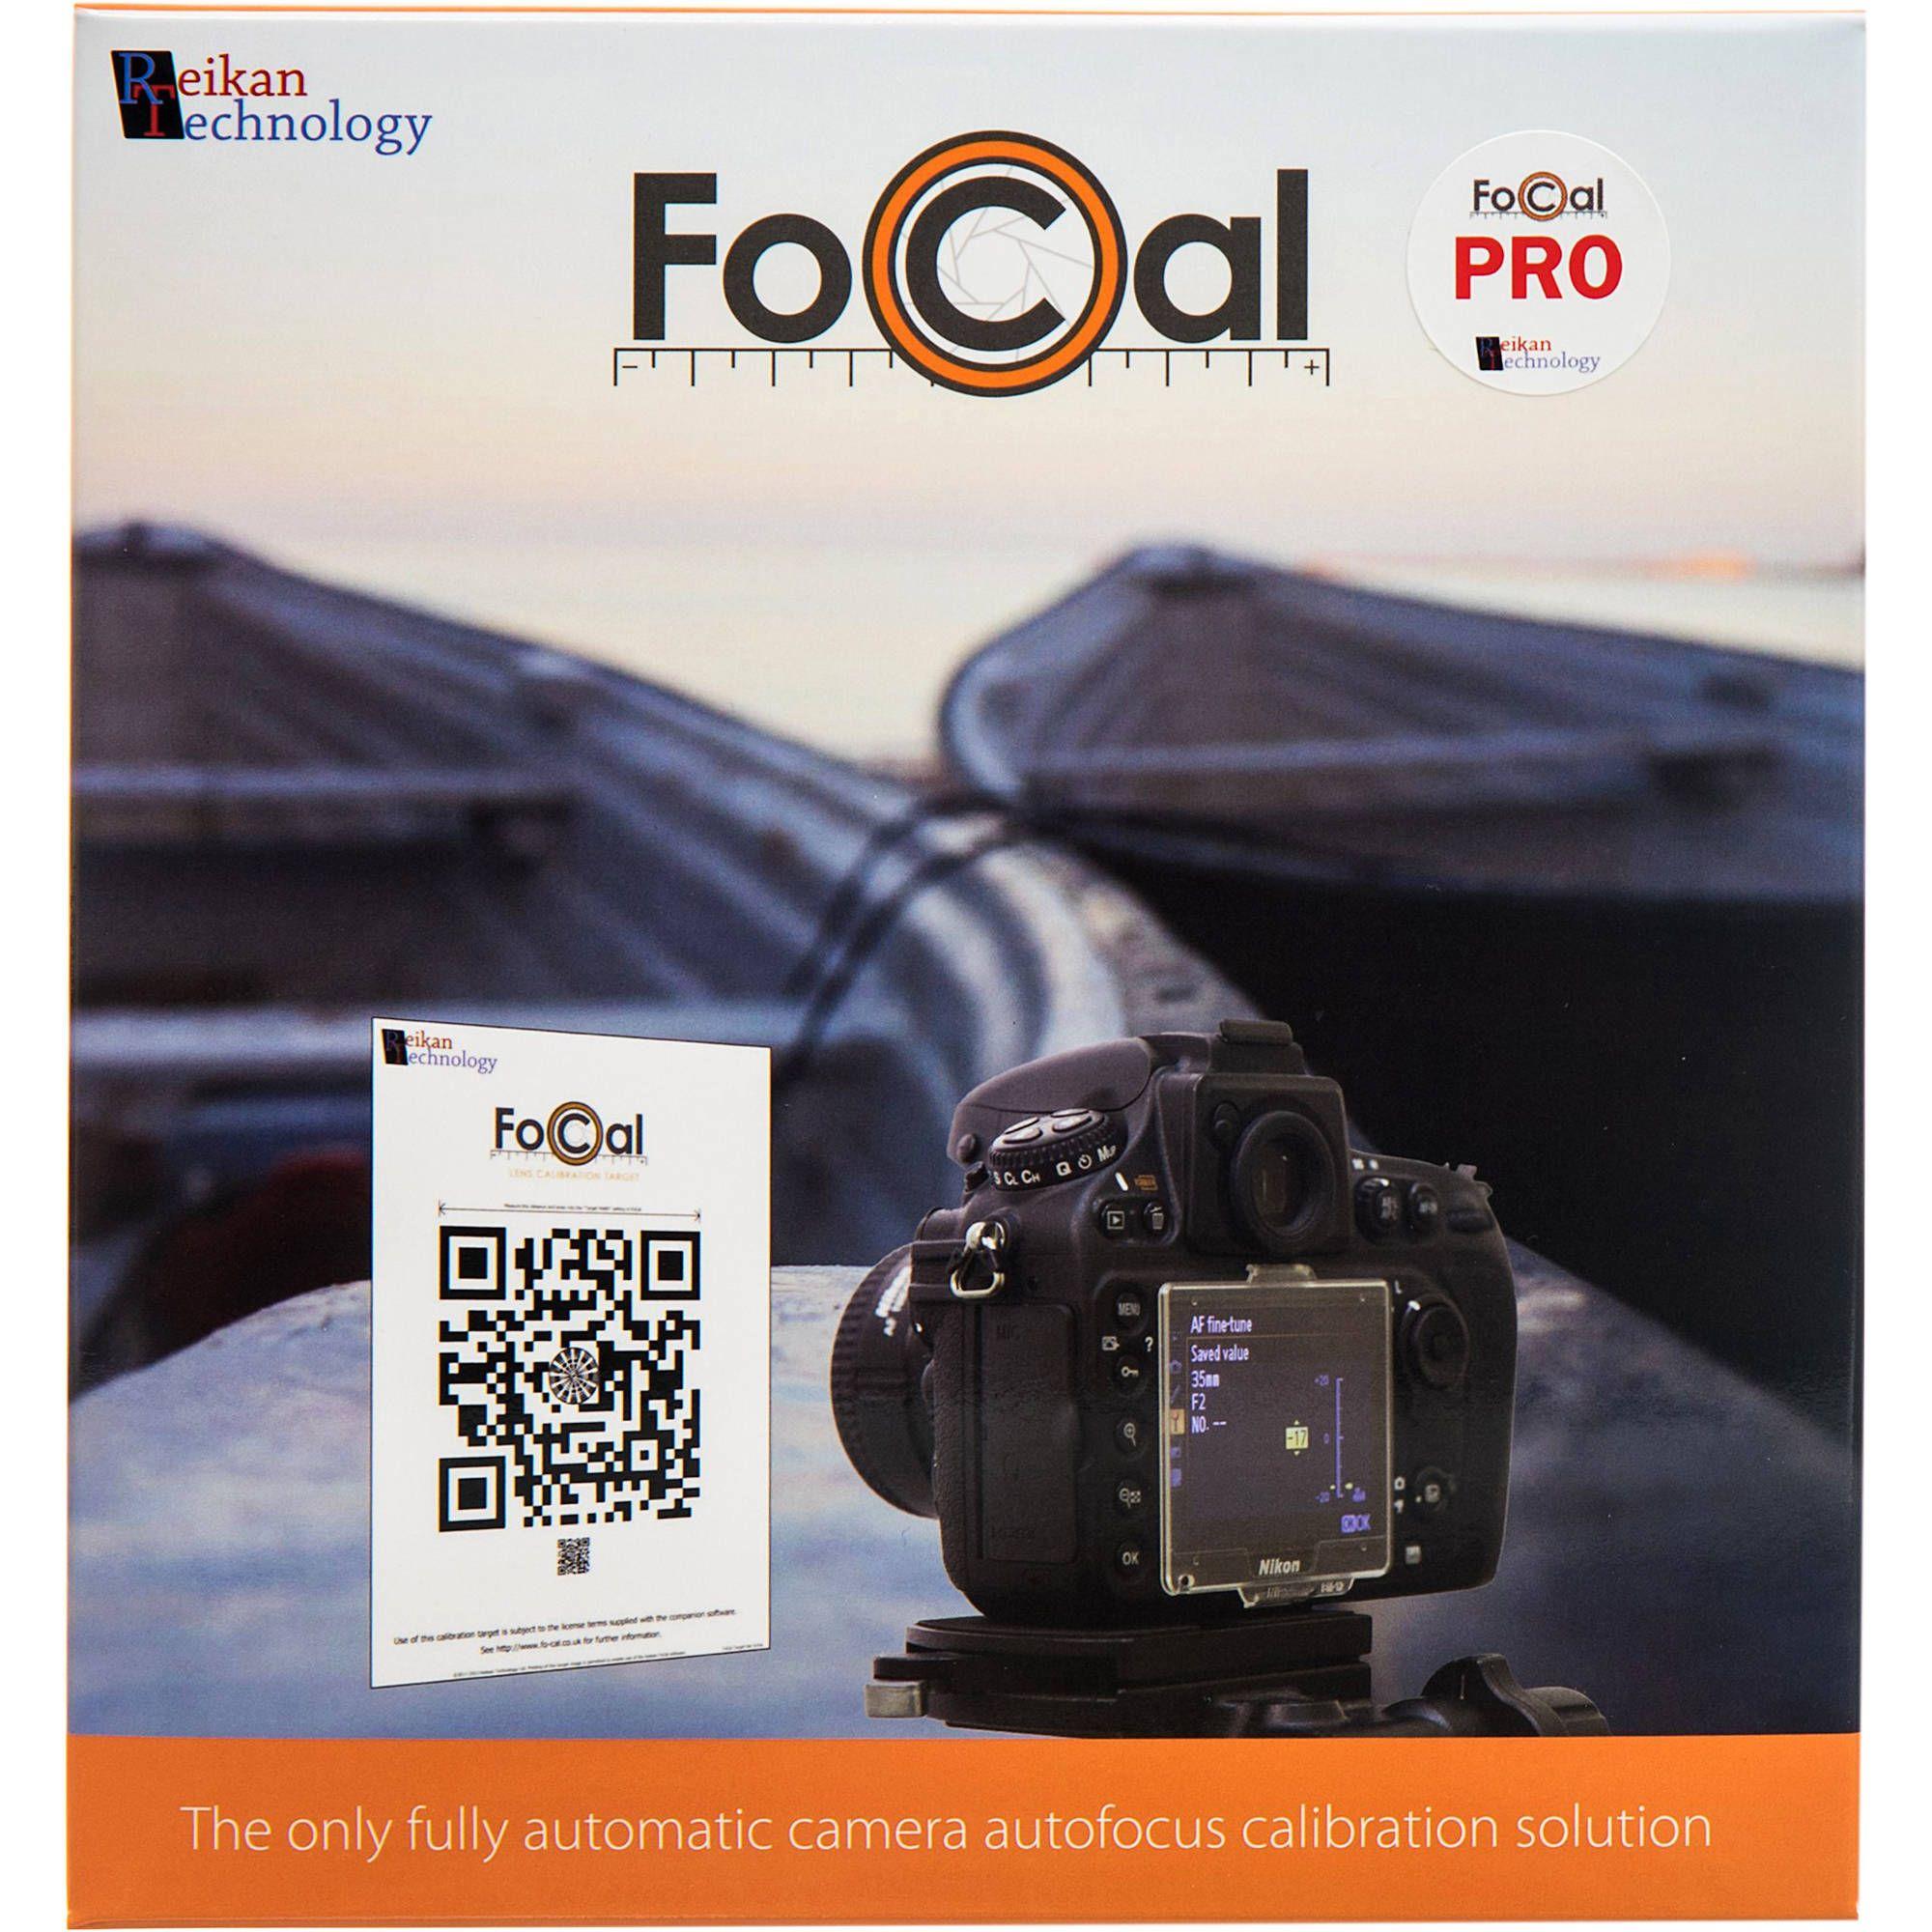 Reikan Focal Focal 2 0 Pro Lens Calibration Camera Lenses Canon Nikon Camera Lenses Nikon Lens